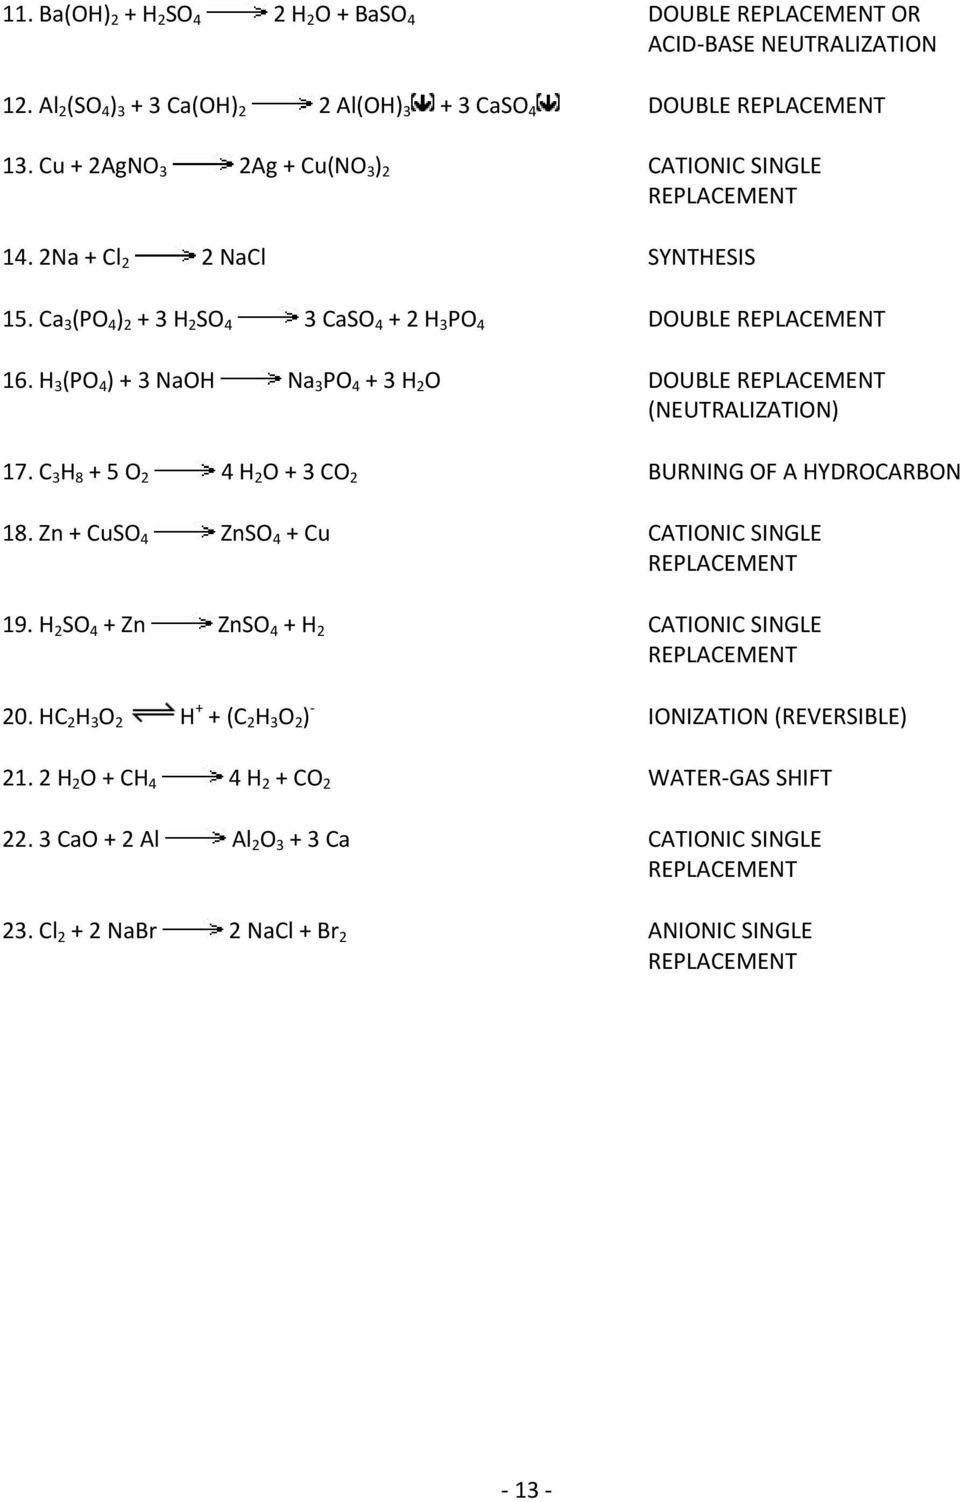 medium resolution of h 3 po 4 3 naoh na 3 po 4 3 h